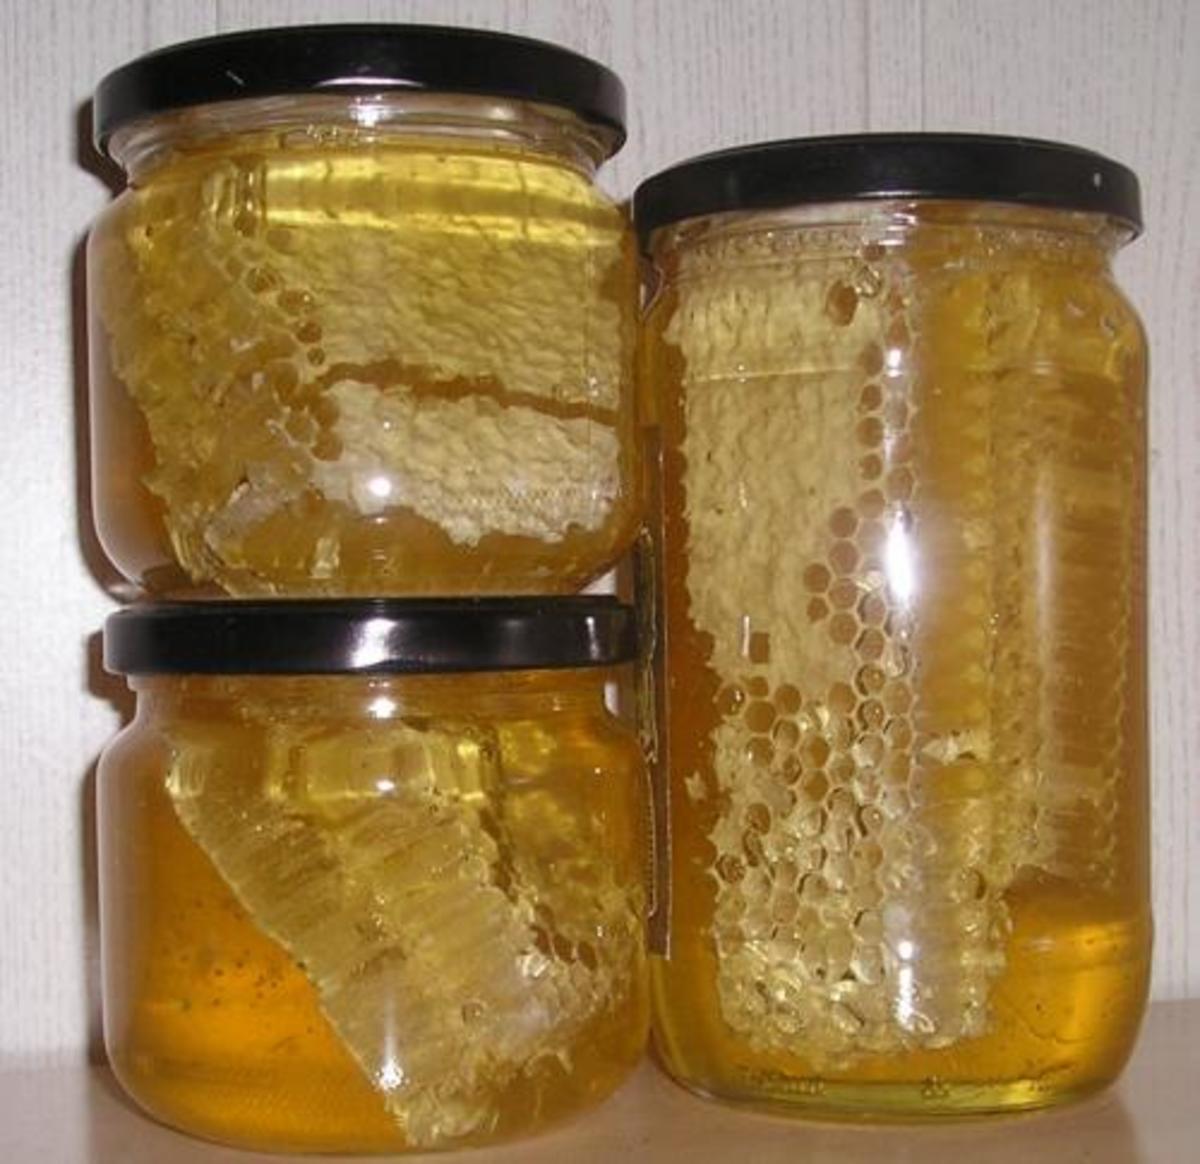 Honeycomb Honey in Jars